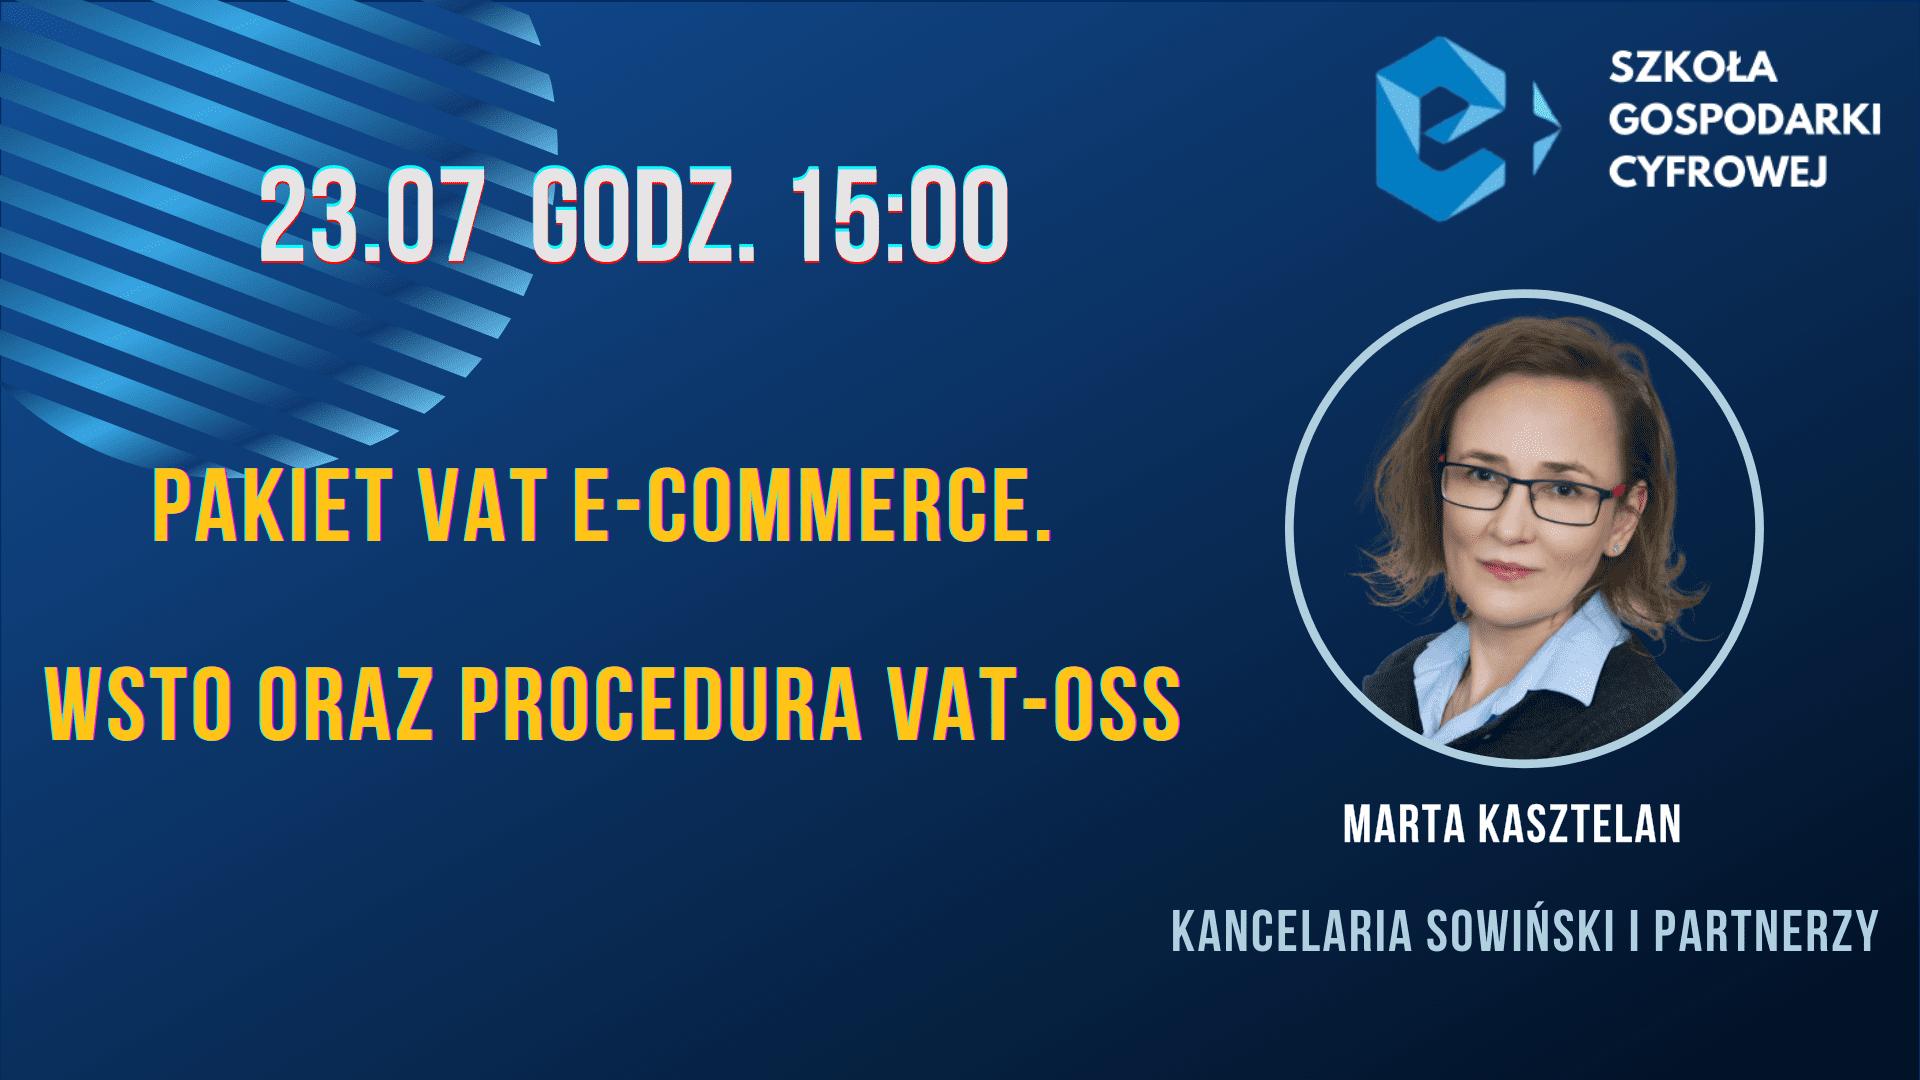 Pakiet VAT e-commerce. WSTO oraz procedura VAT-OSS